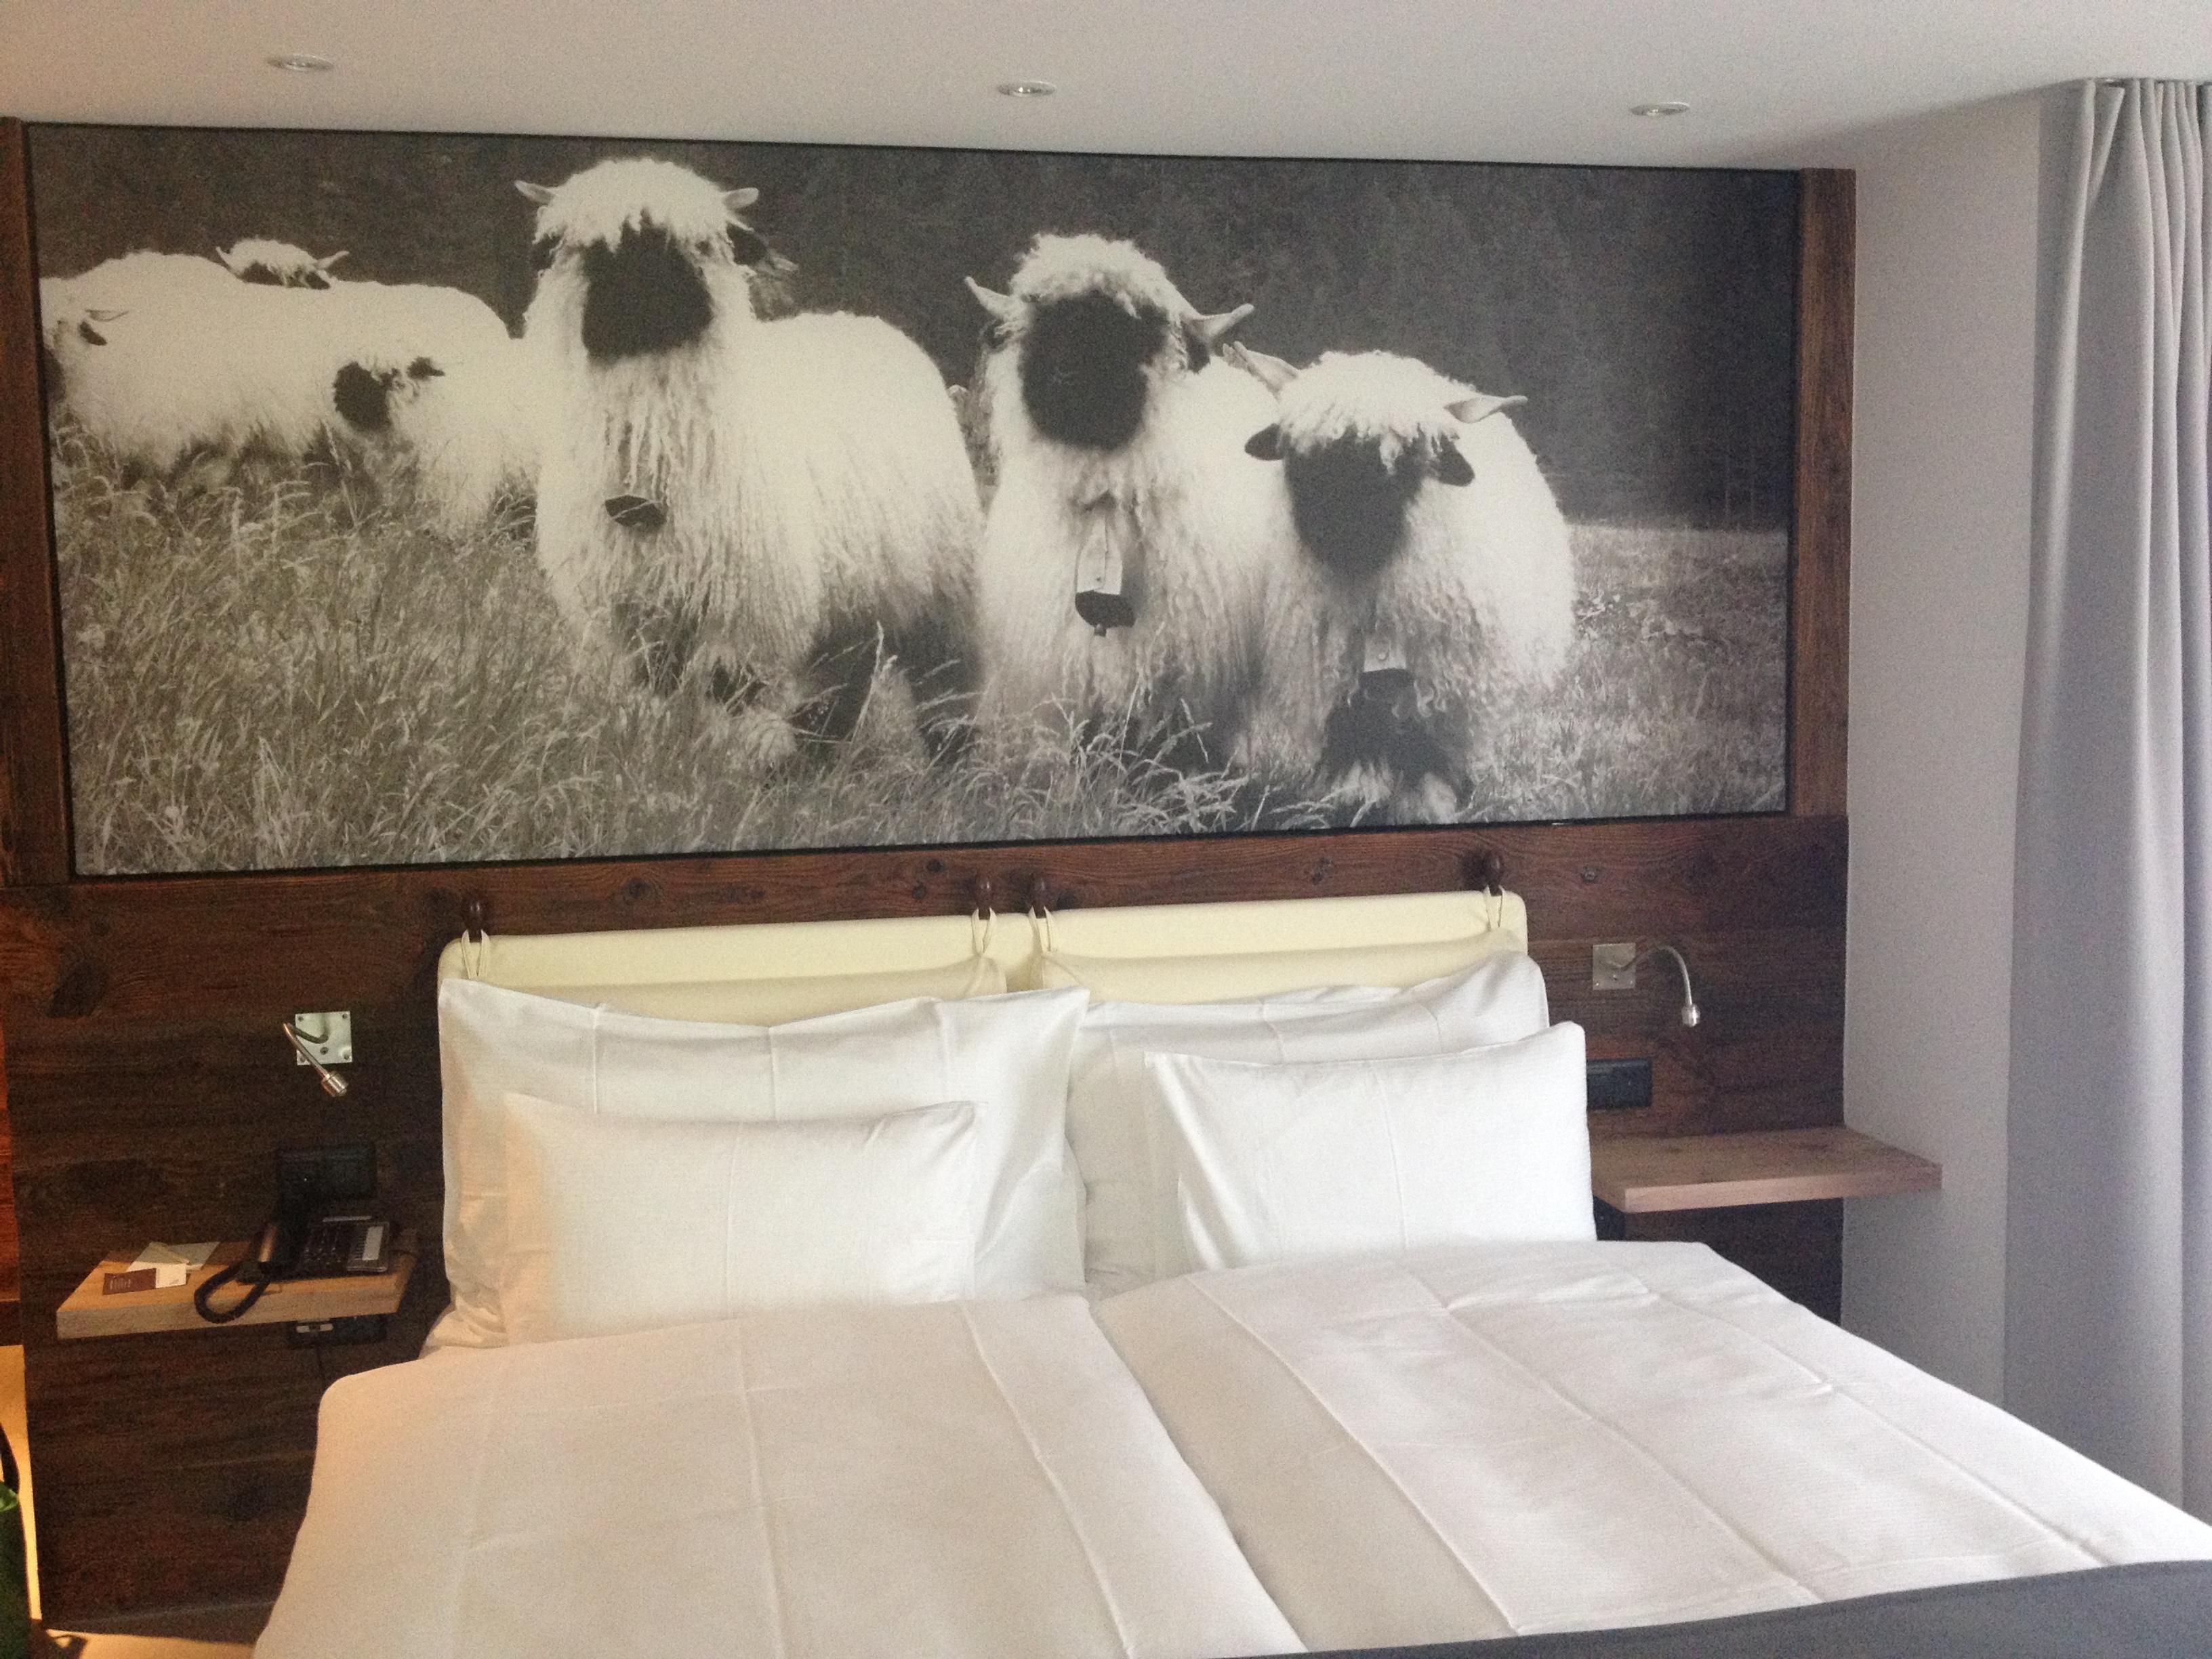 Europe Hotel and SPA, Zermatt @oltreilbalcone